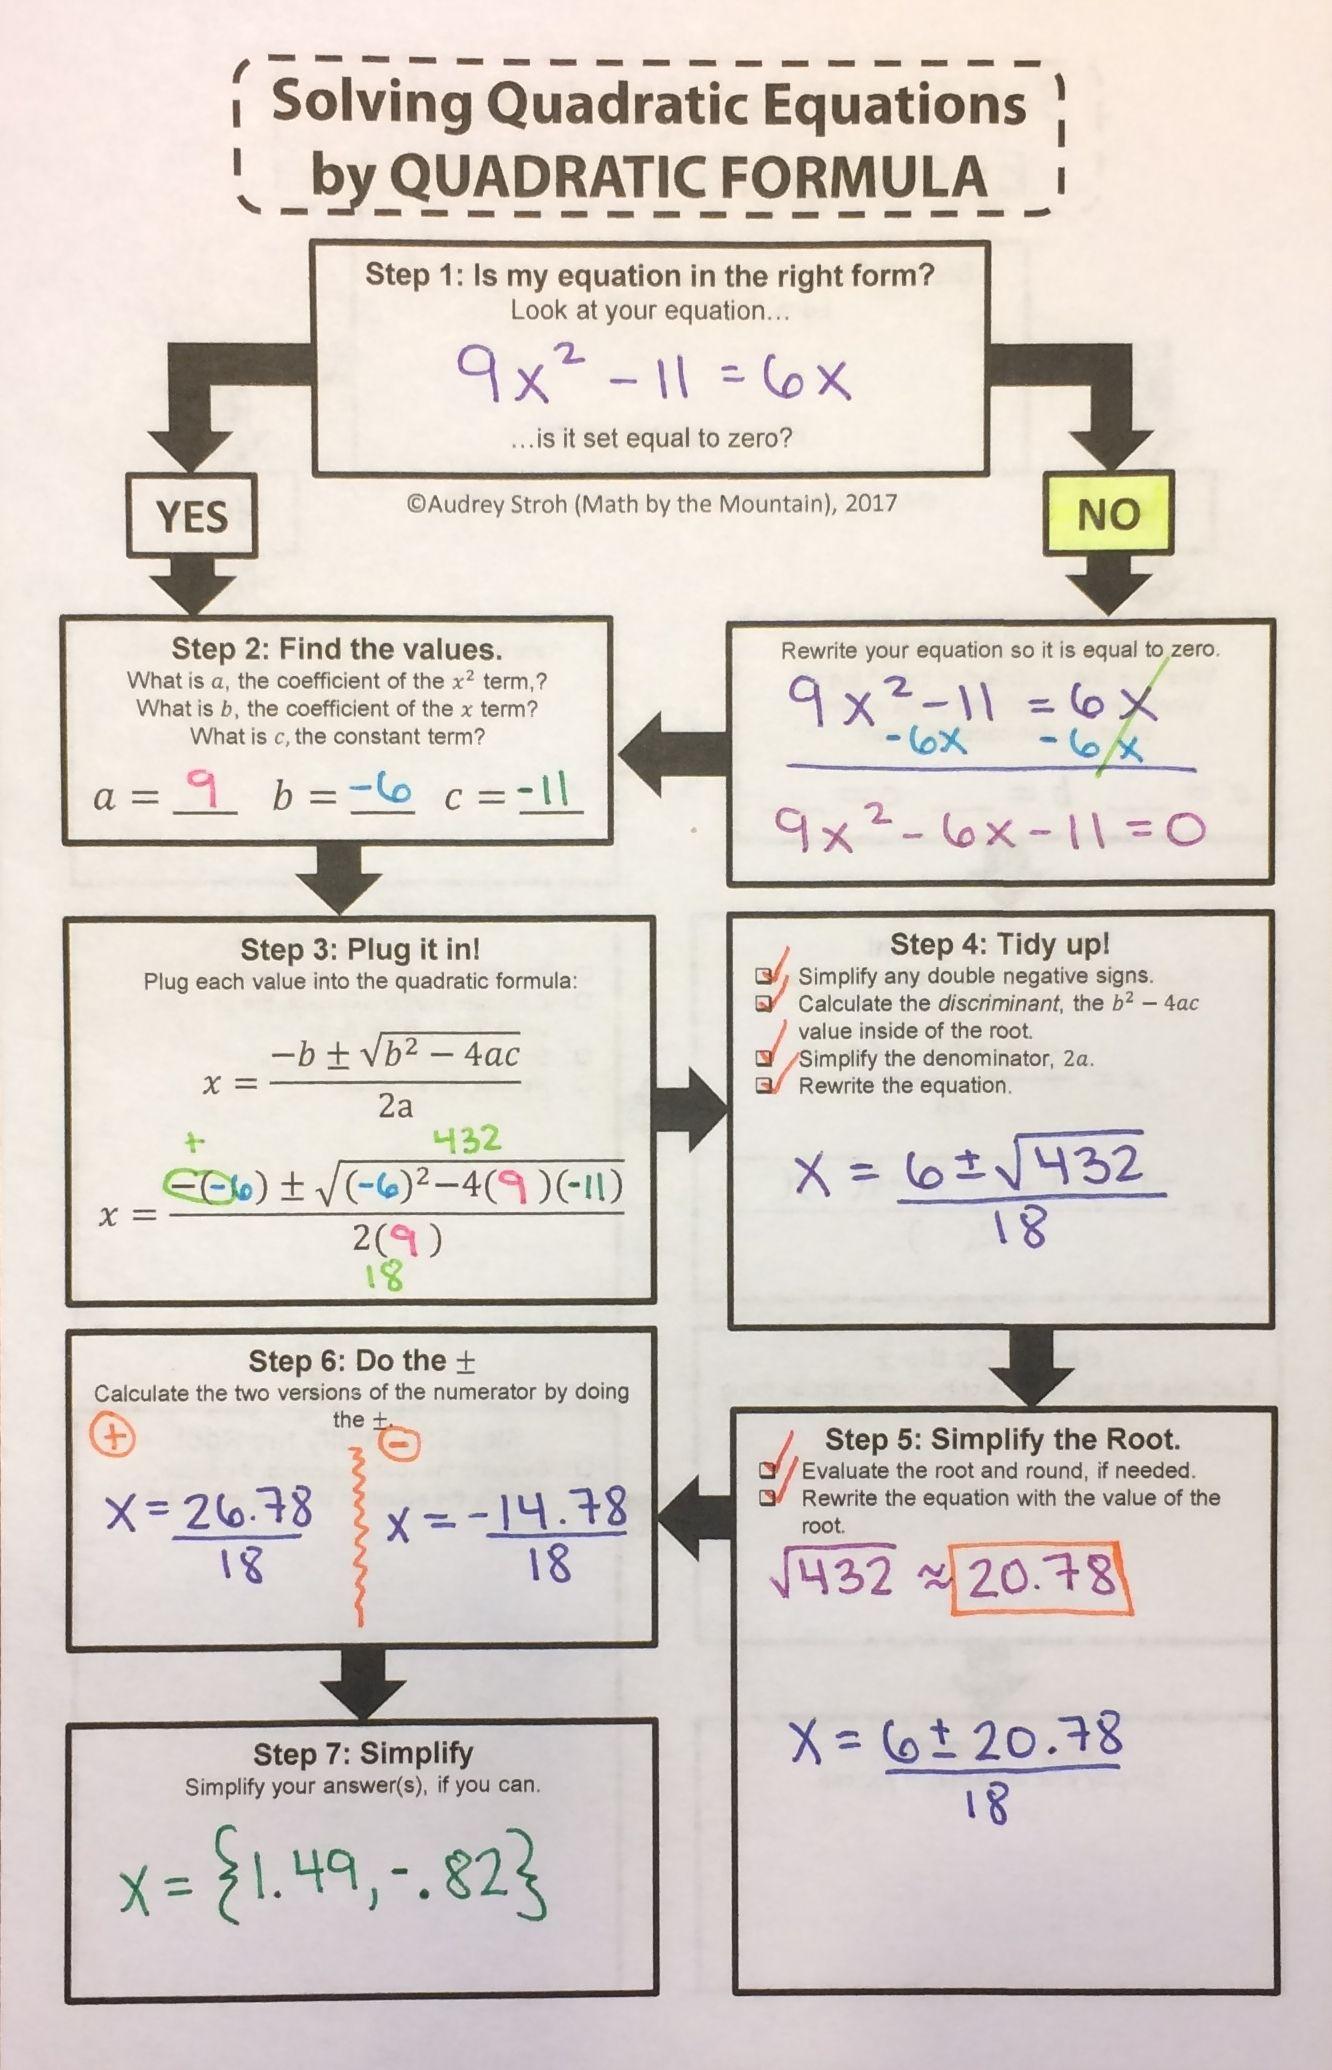 solving quadratic equations *flowchart* graphic organizers bundle